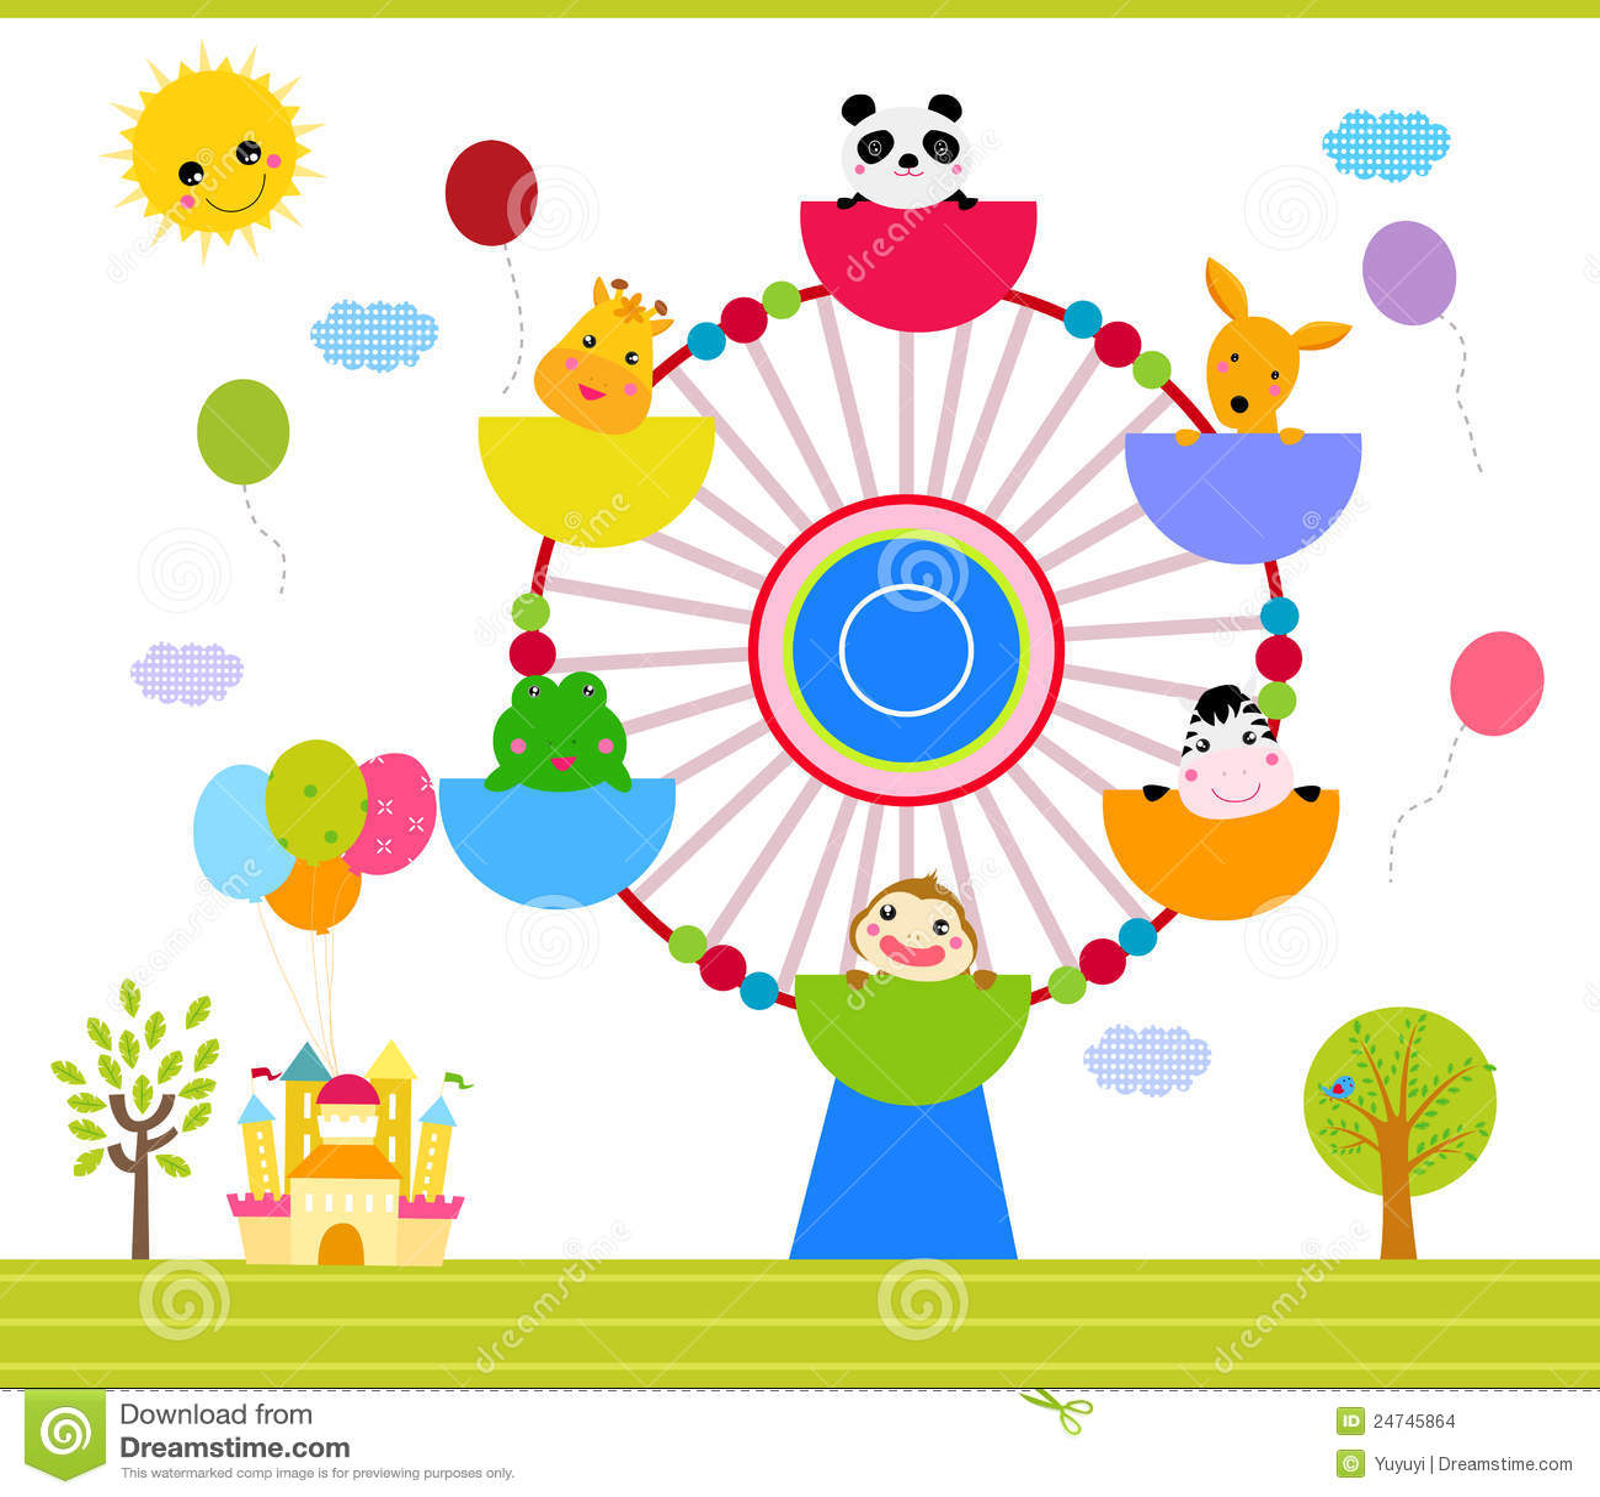 Ferris Wheel With Happy Animals Stock Images - Image: 24745864